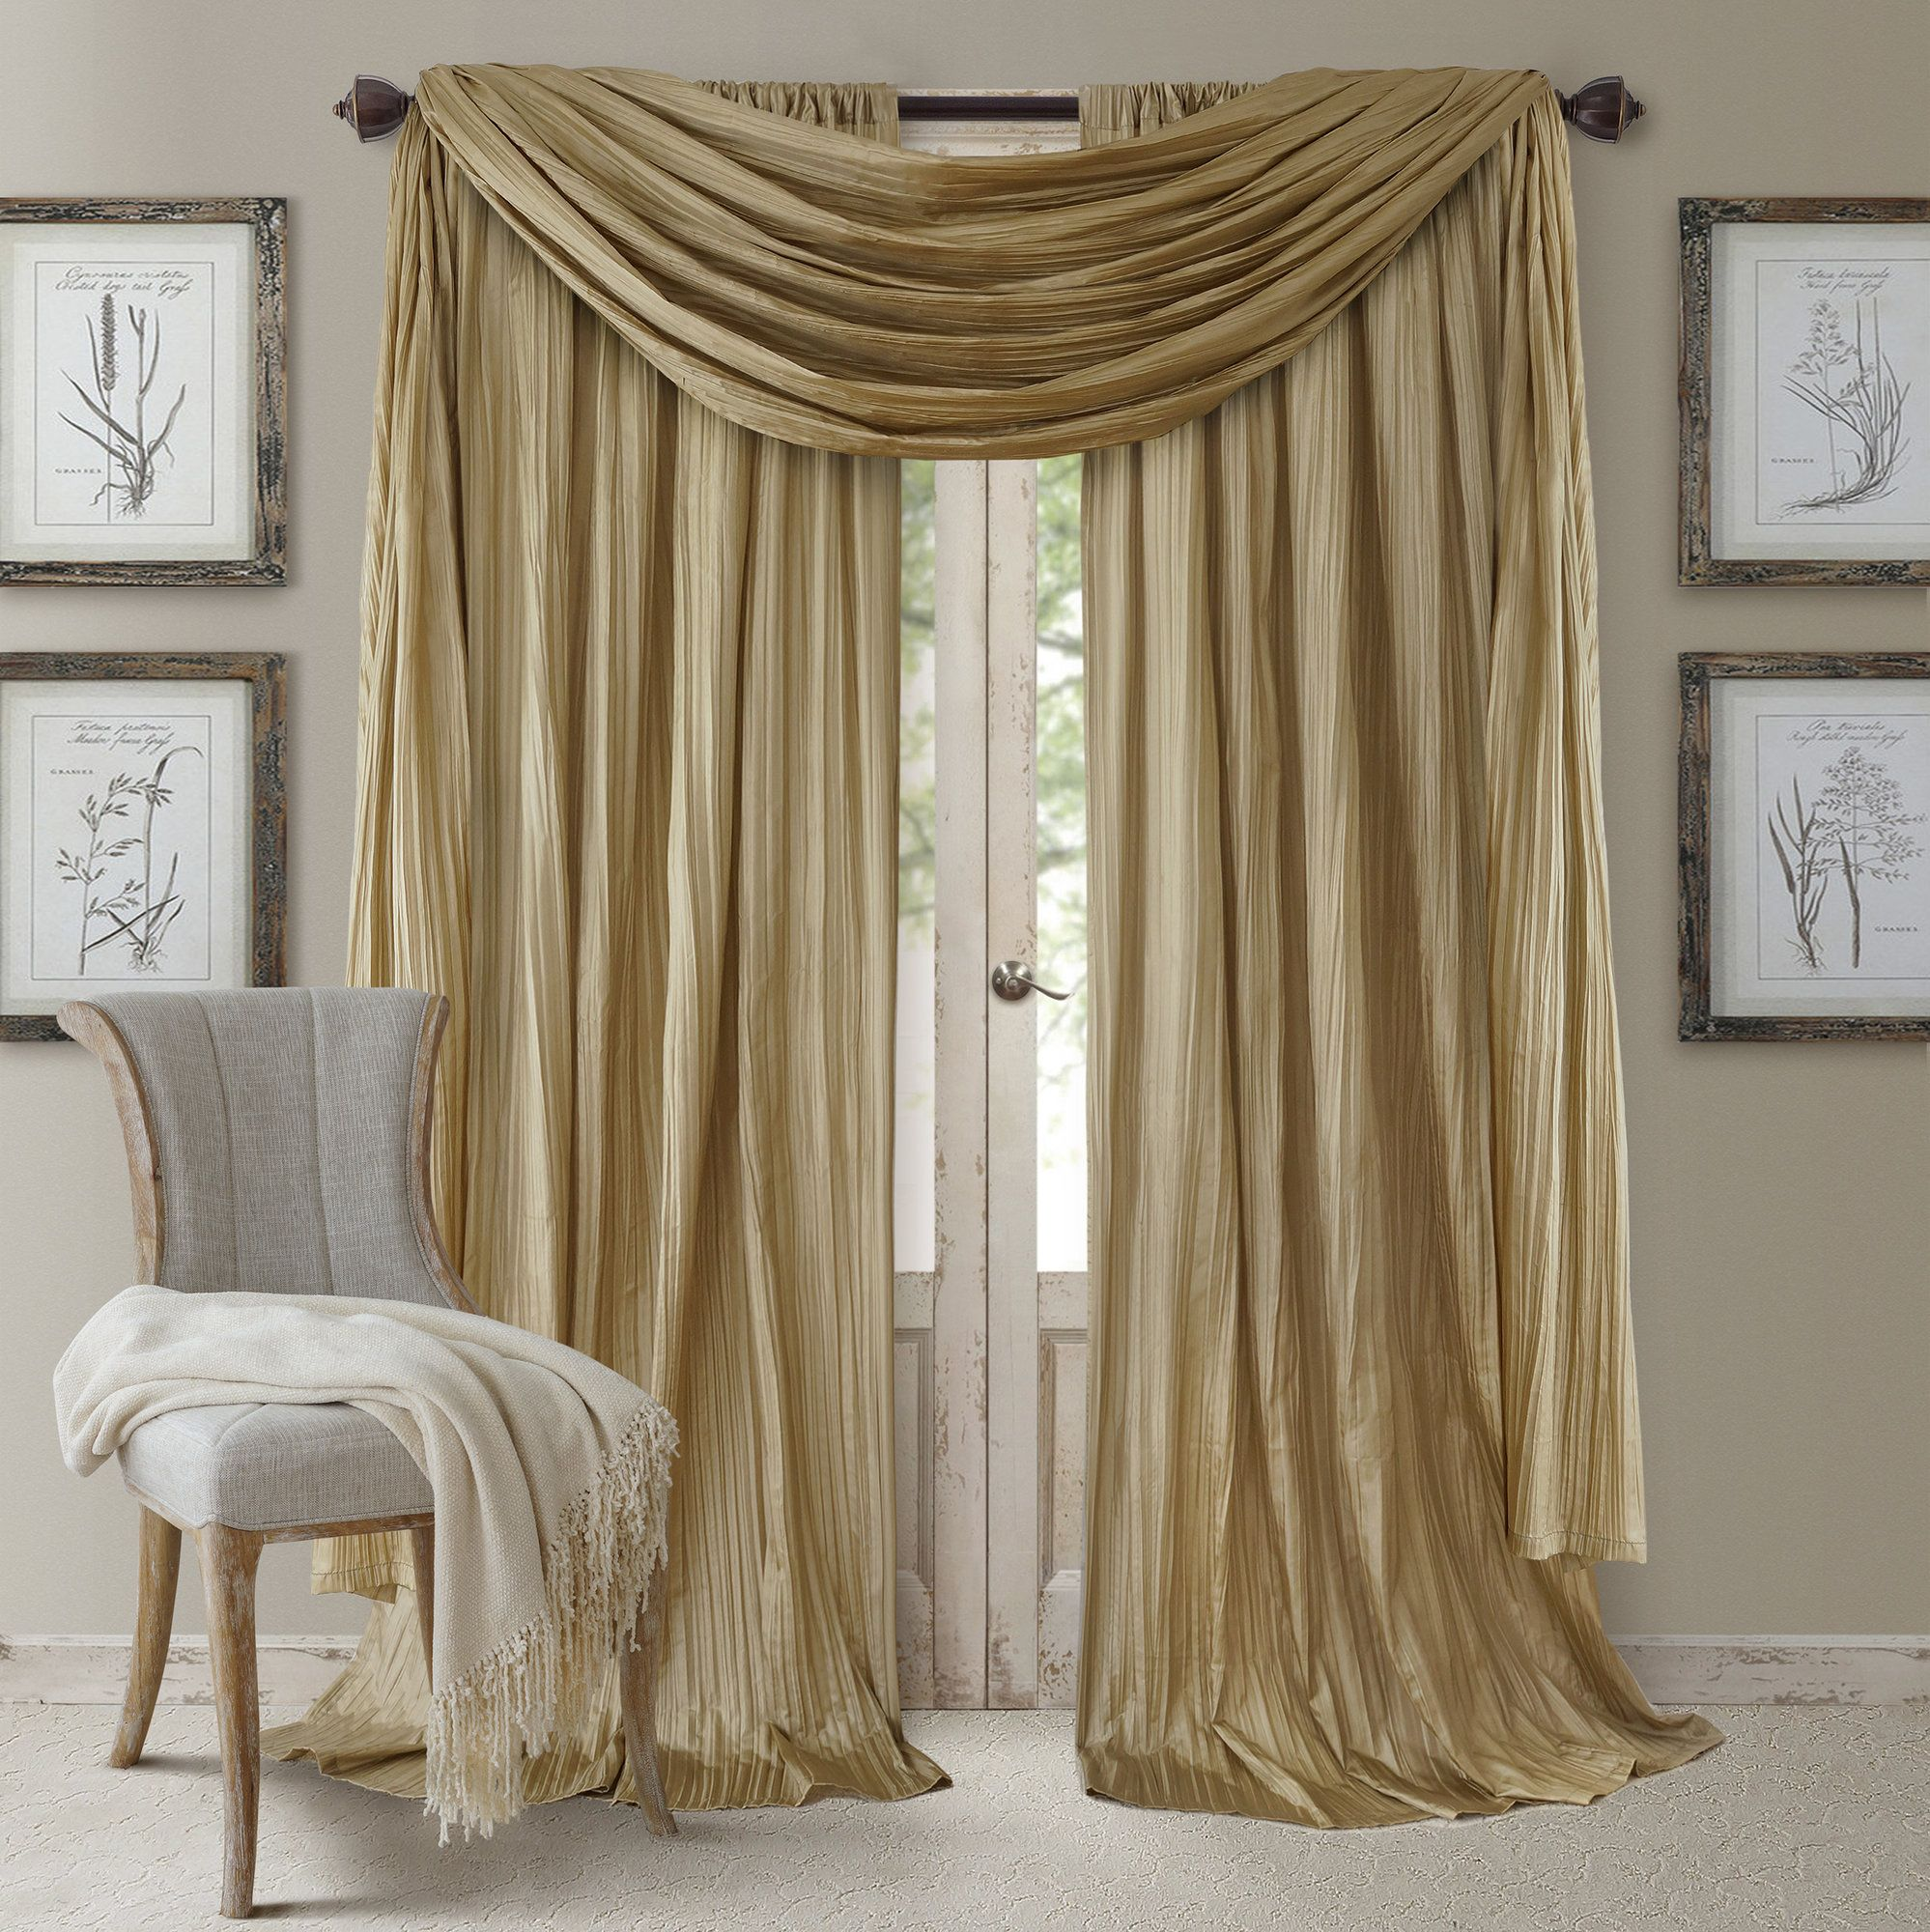 flat block in roman panels winchester treatments custom window interiormp shade drapery lynn with curtain color lif richmond